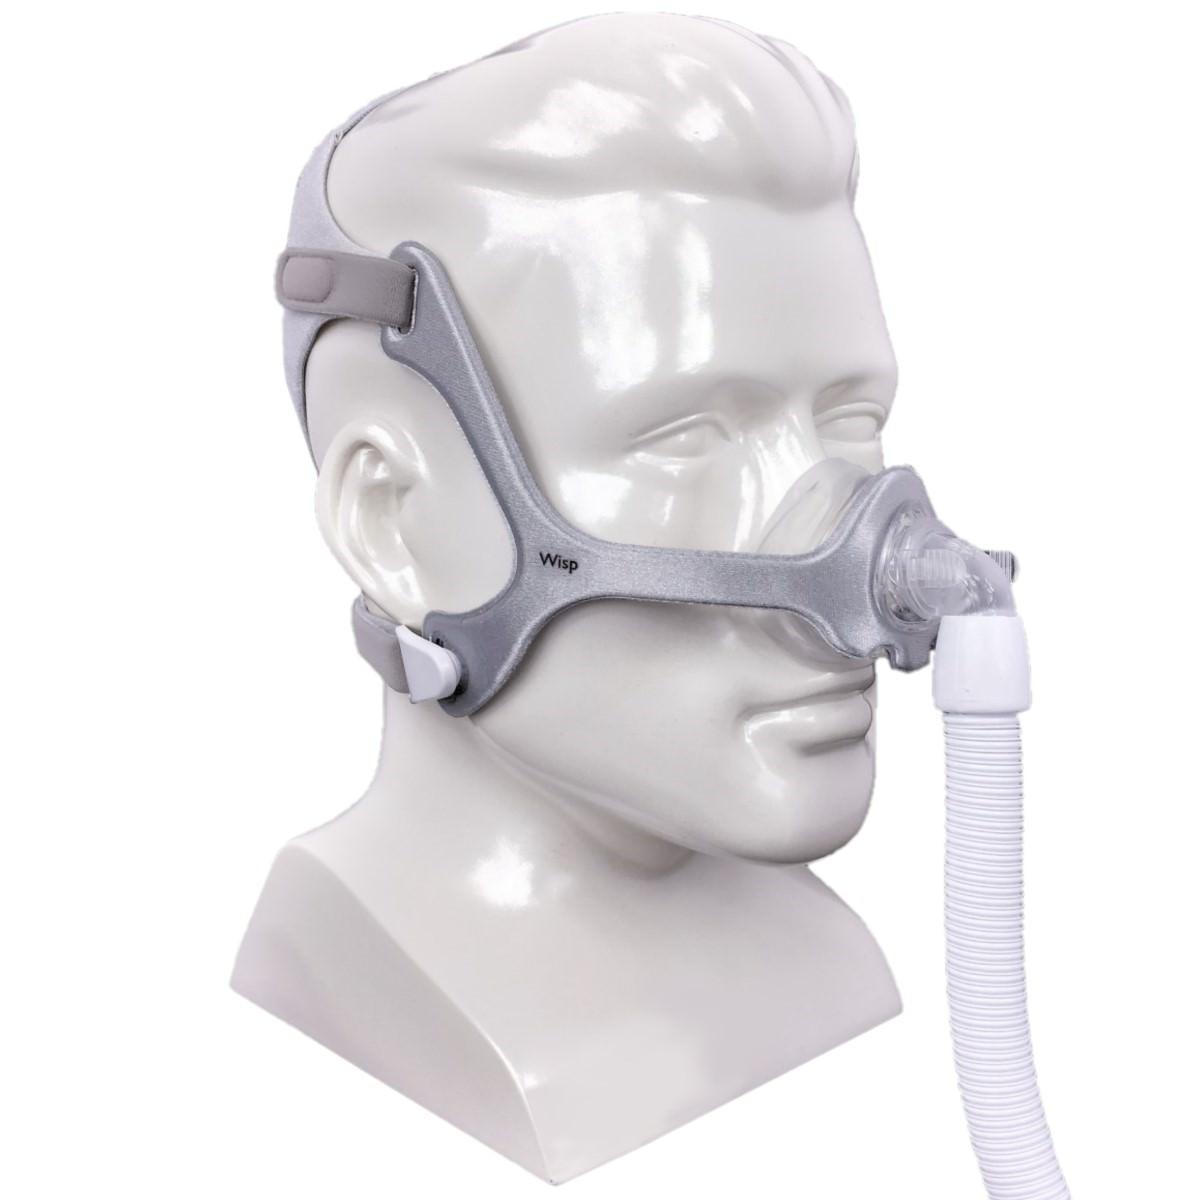 wisp nasal cpap mask by respironics